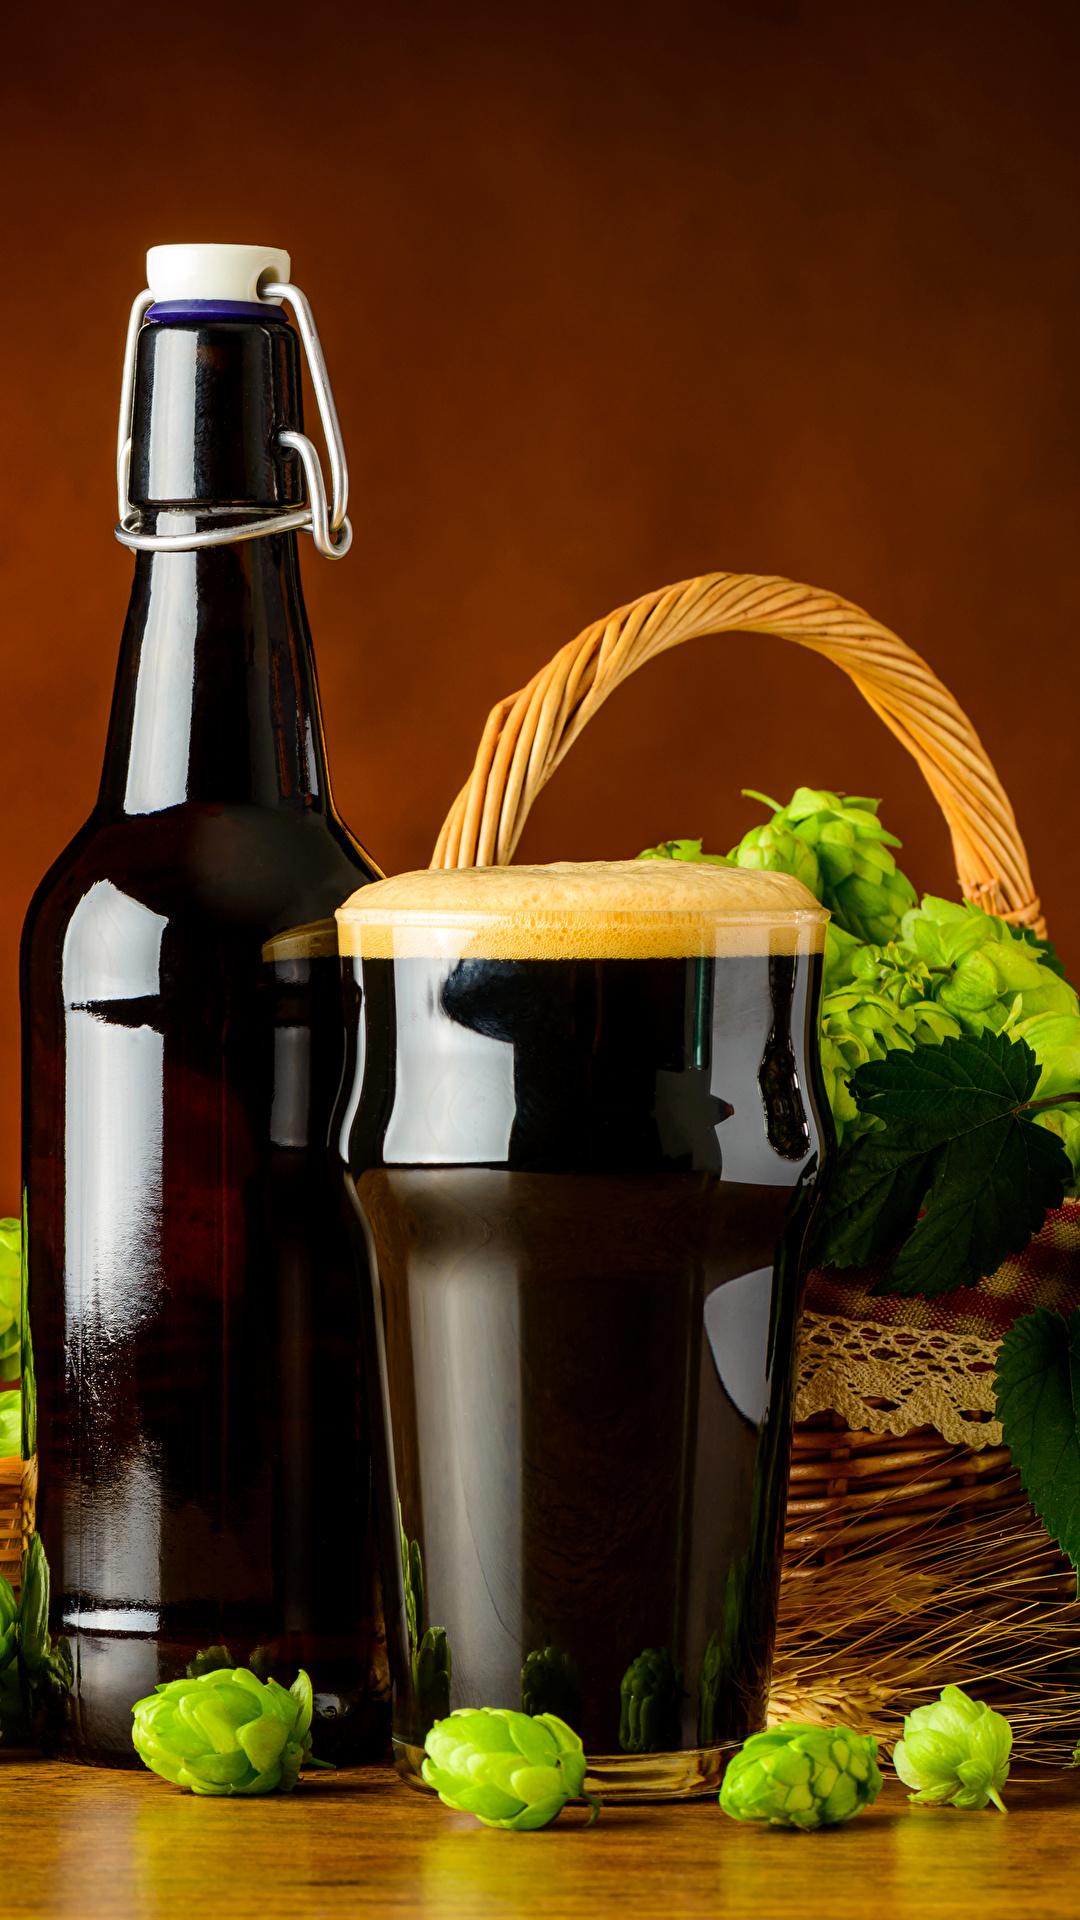 Картинки Пиво Хмель Стакан Пища Пена Бутылка 1080x1920 стакана стакане Еда пене пеной бутылки Продукты питания